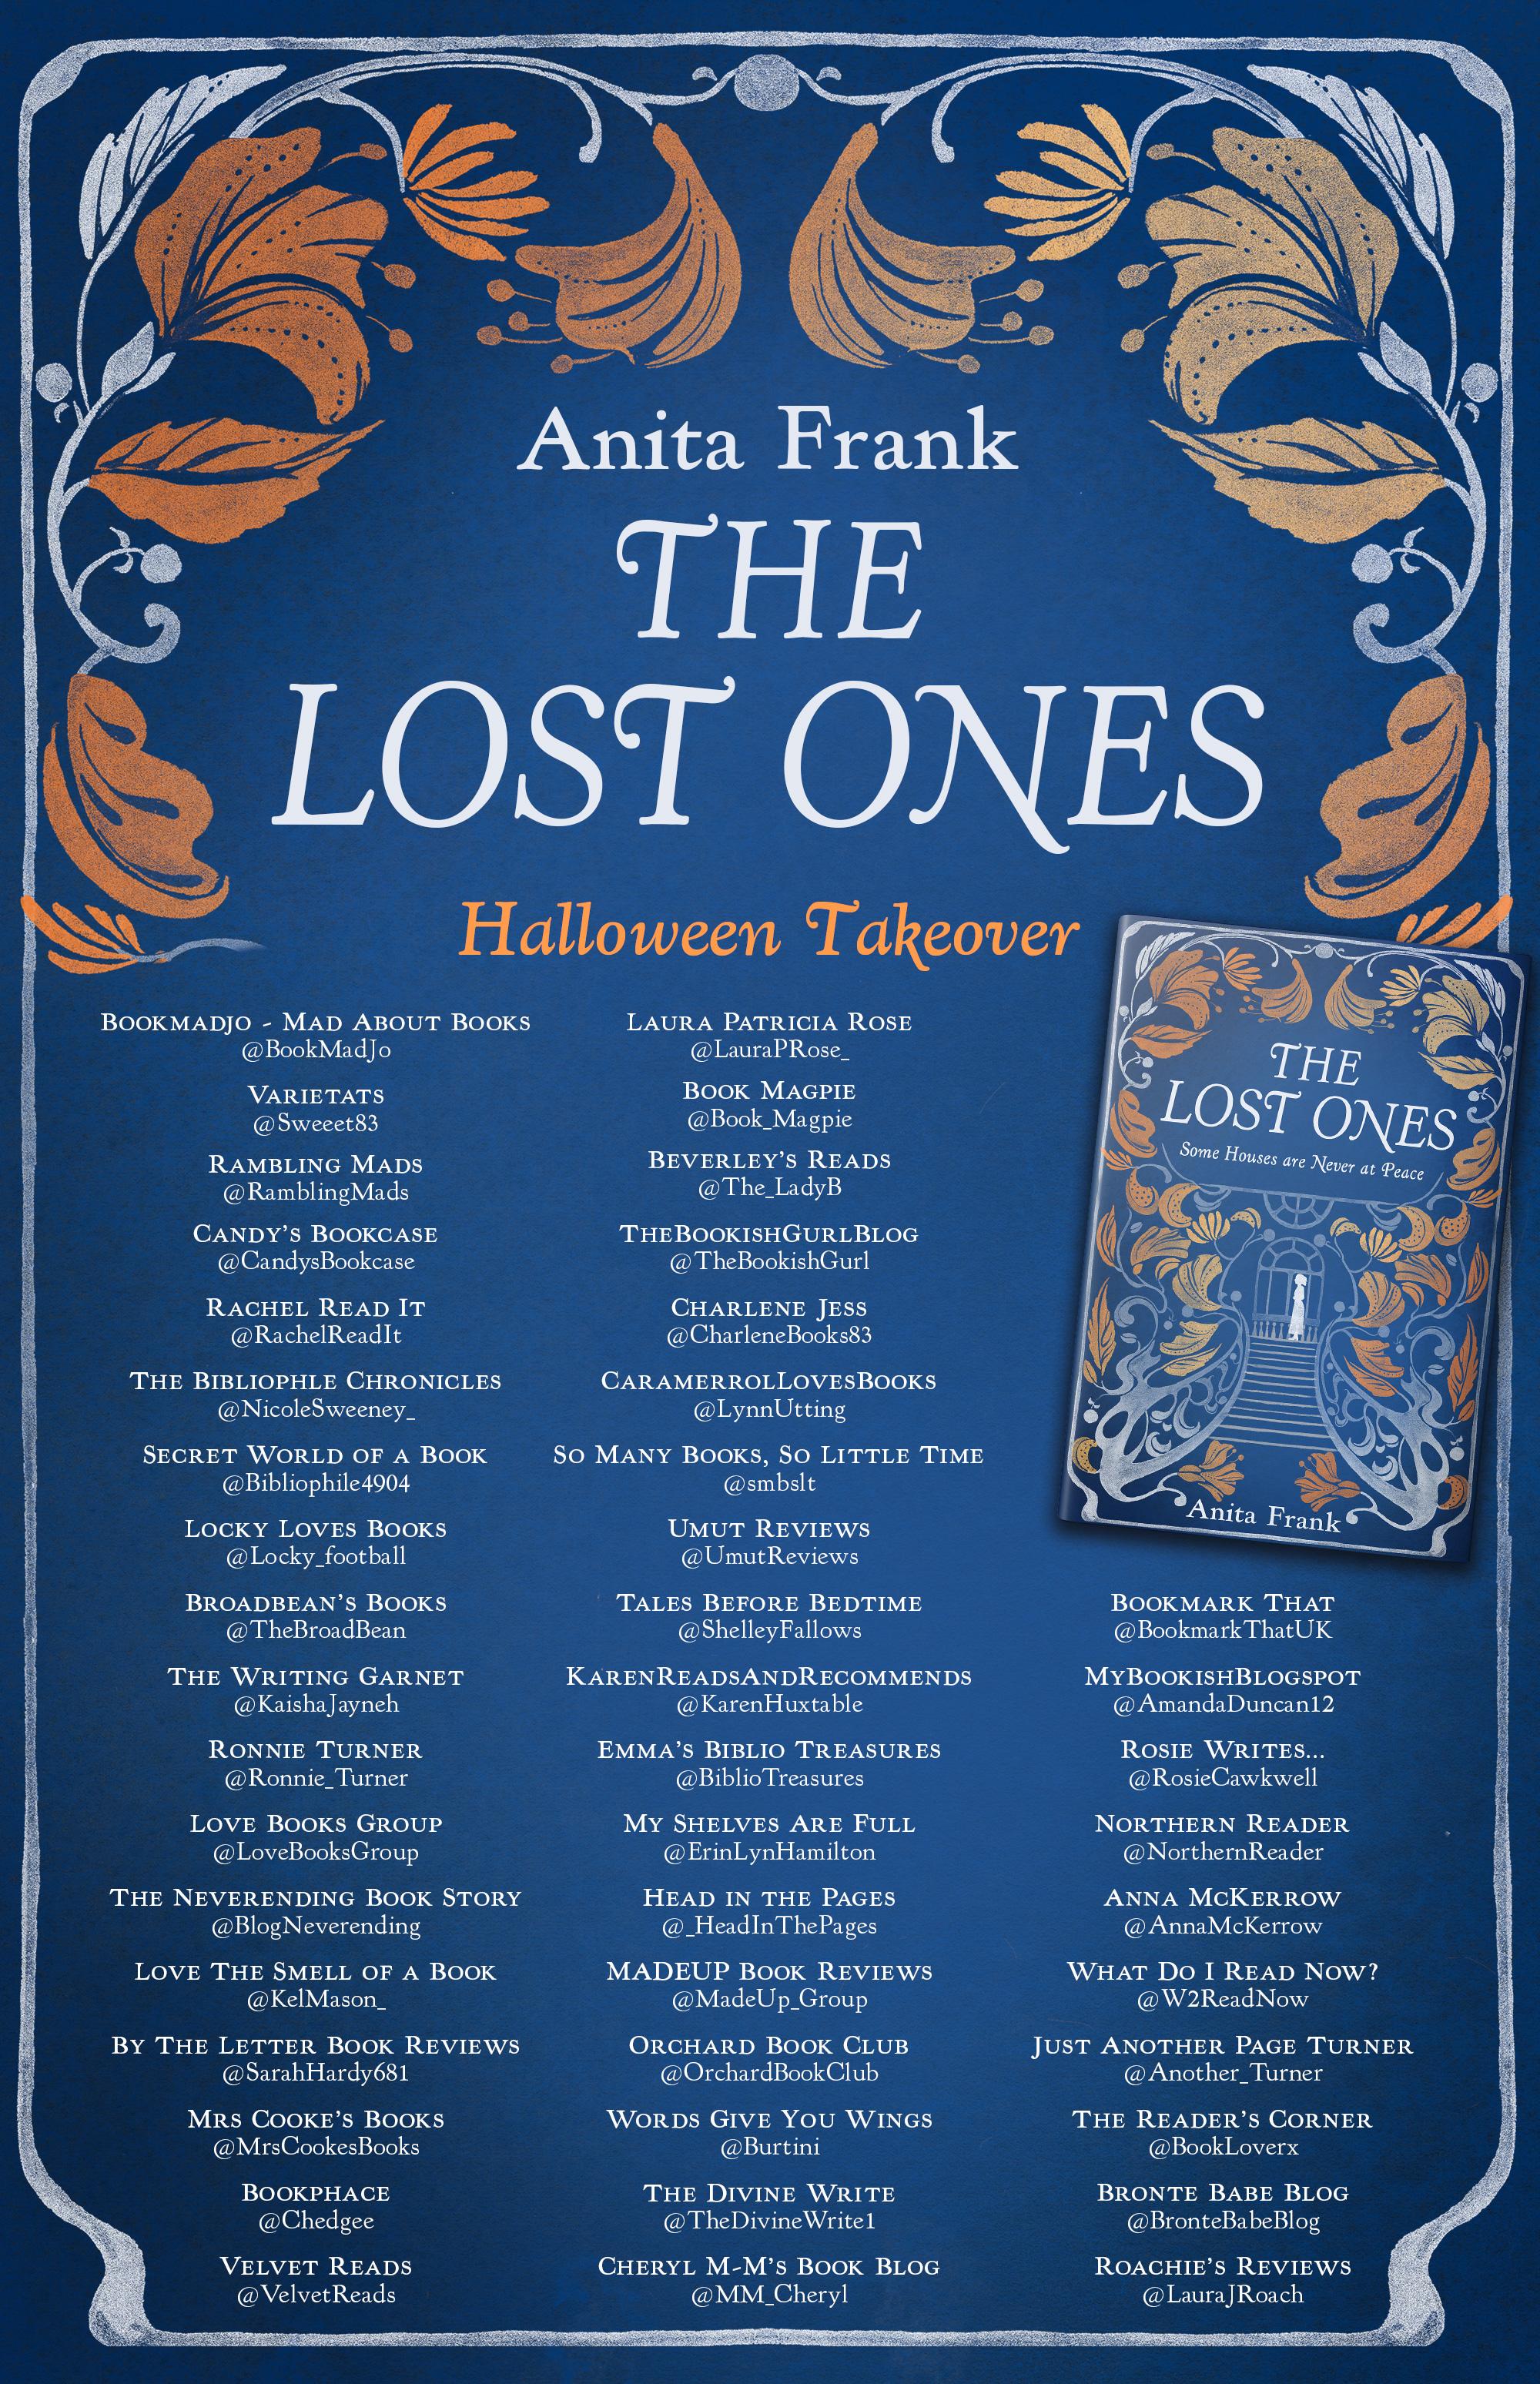 1571221654213_TheLostOnes_HalloweenTakeover.jpg